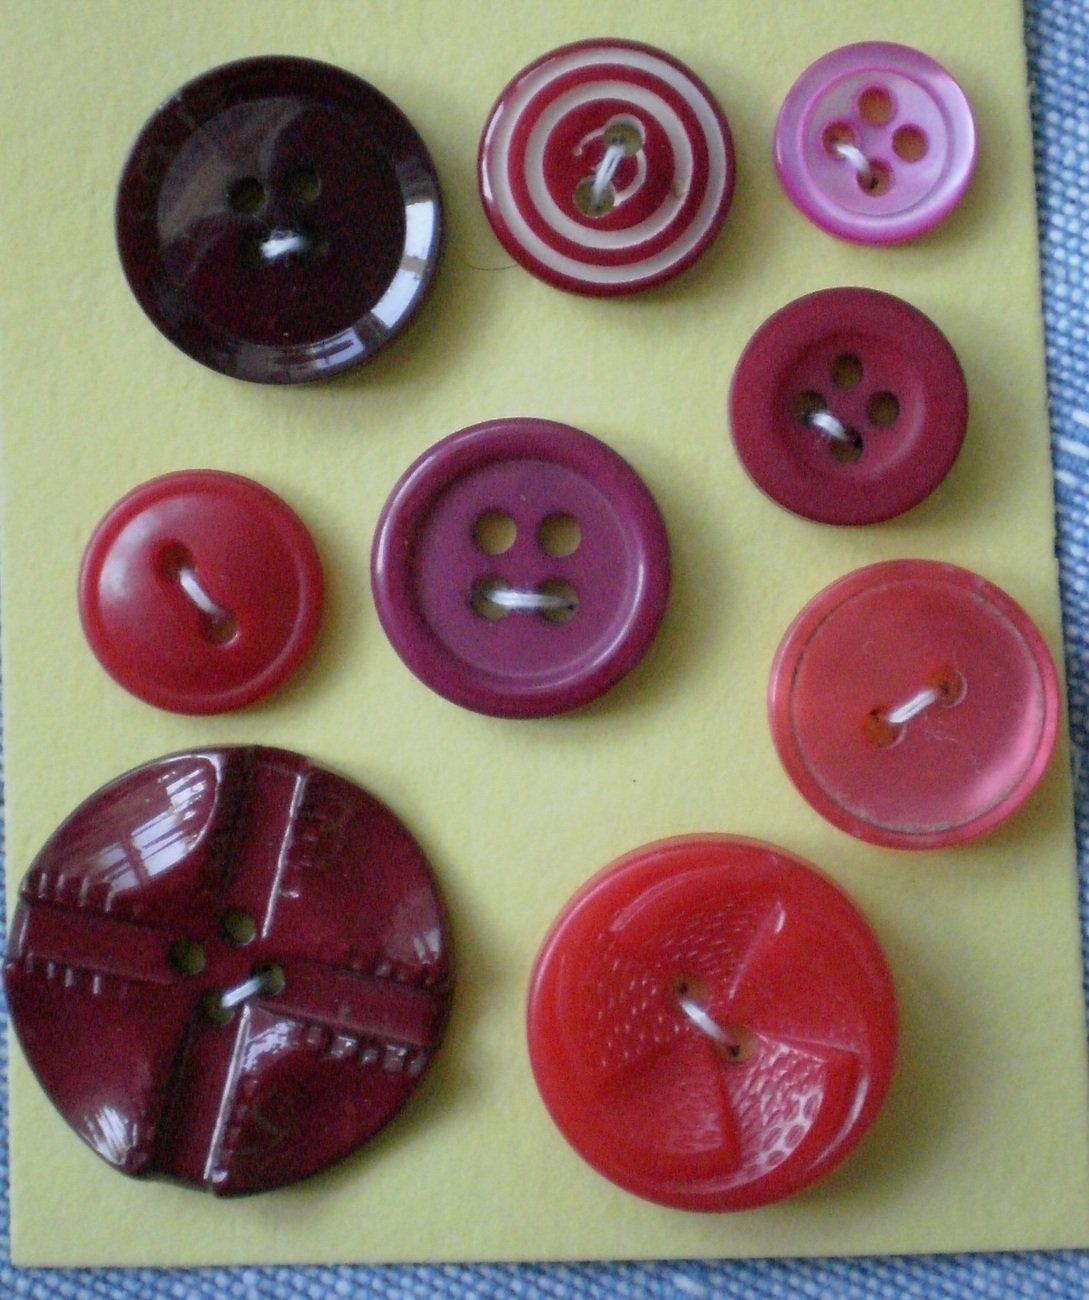 Lot red plastic buttons 2 4 hole vintage Fan Target